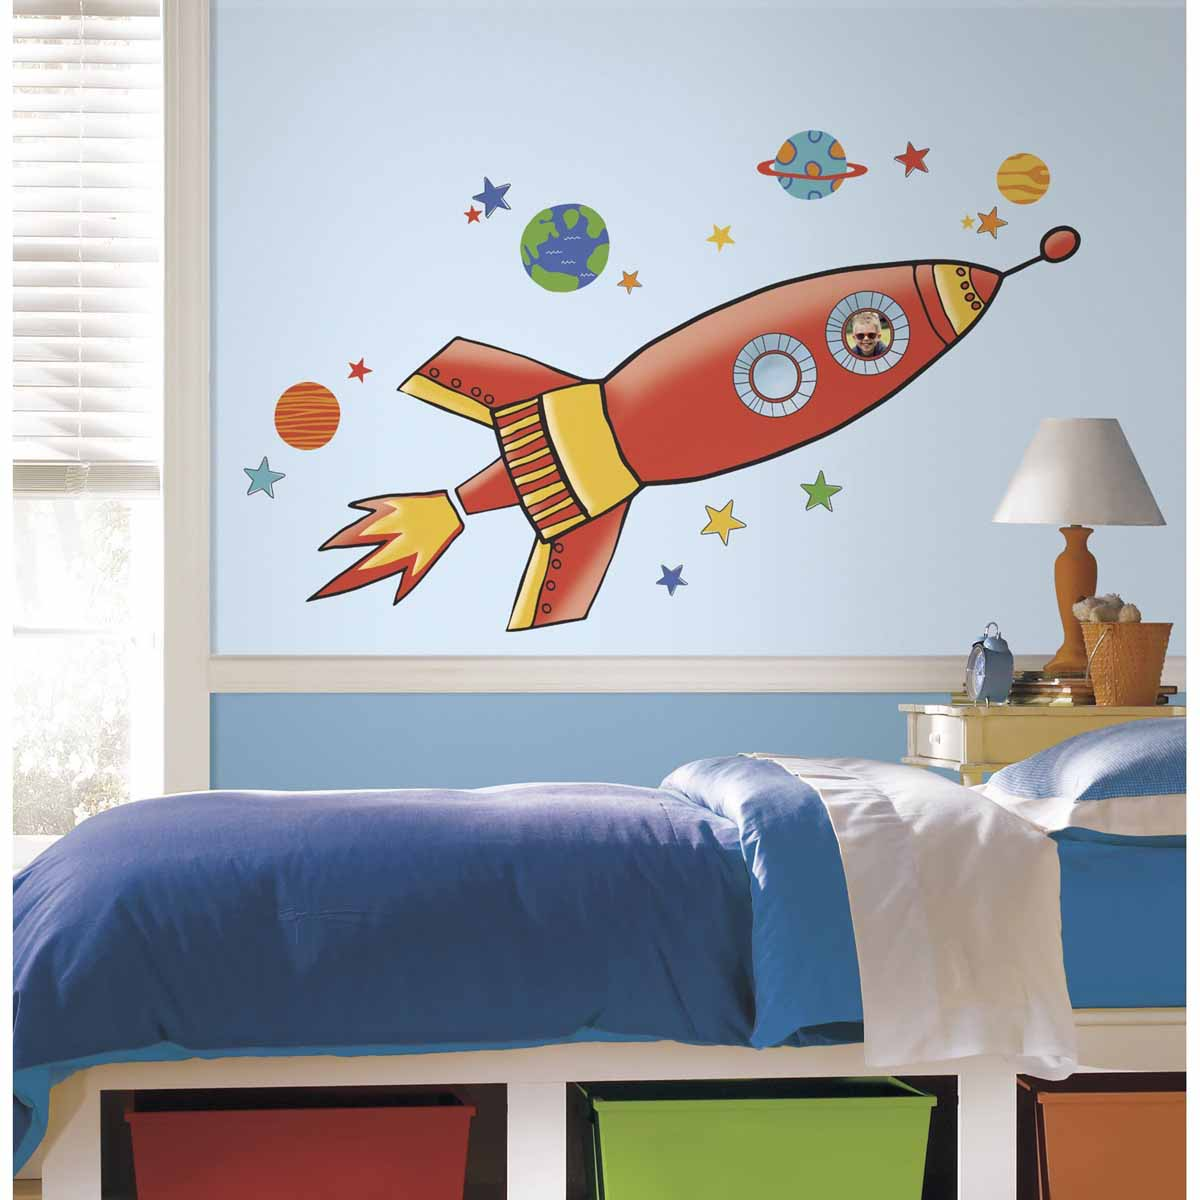 RoomMates Наклейки для декора Ракета -  Детская комната